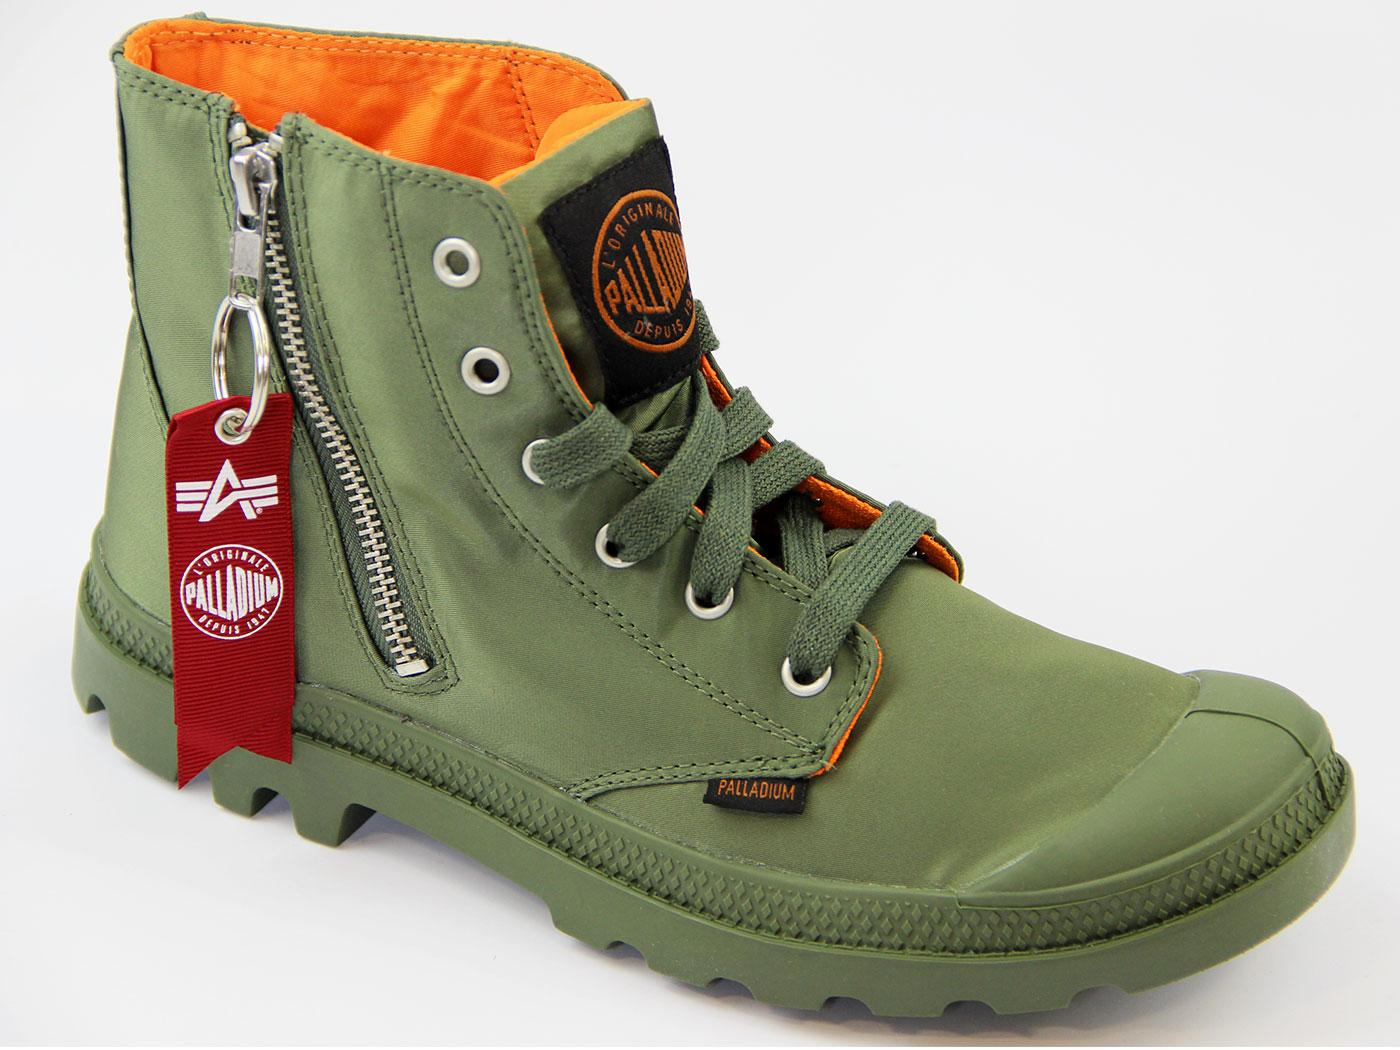 11edcec366 PALLADIUM Pampa Hi Zip MA-1 ALPHA INDUSTRIES Retro Boots Sage